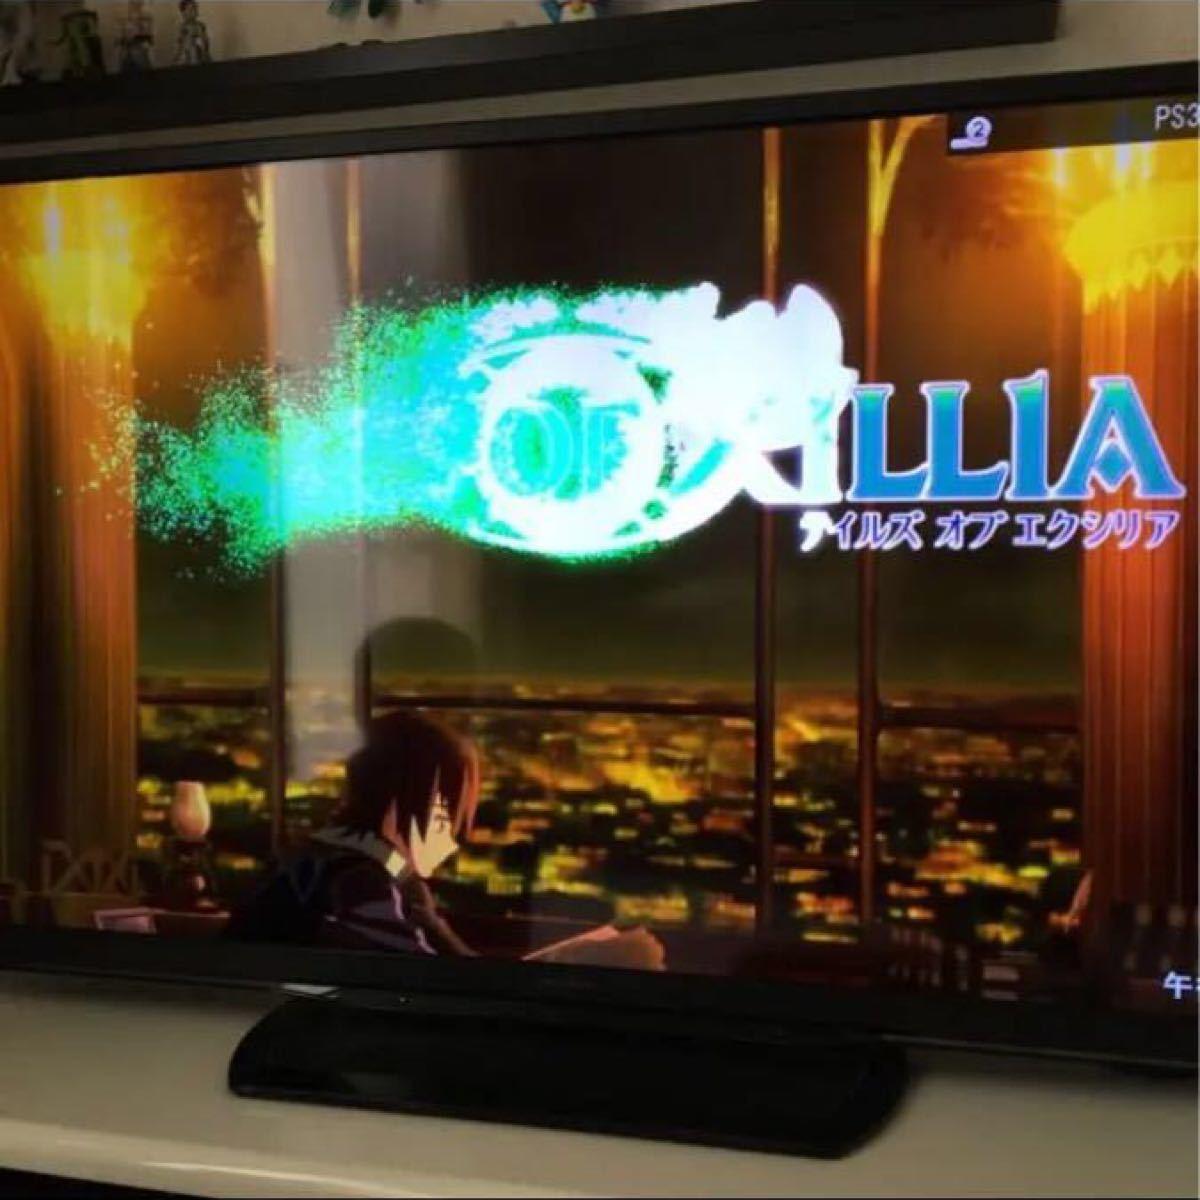 【PS3ソフト】テイルズ オブ エクシリア